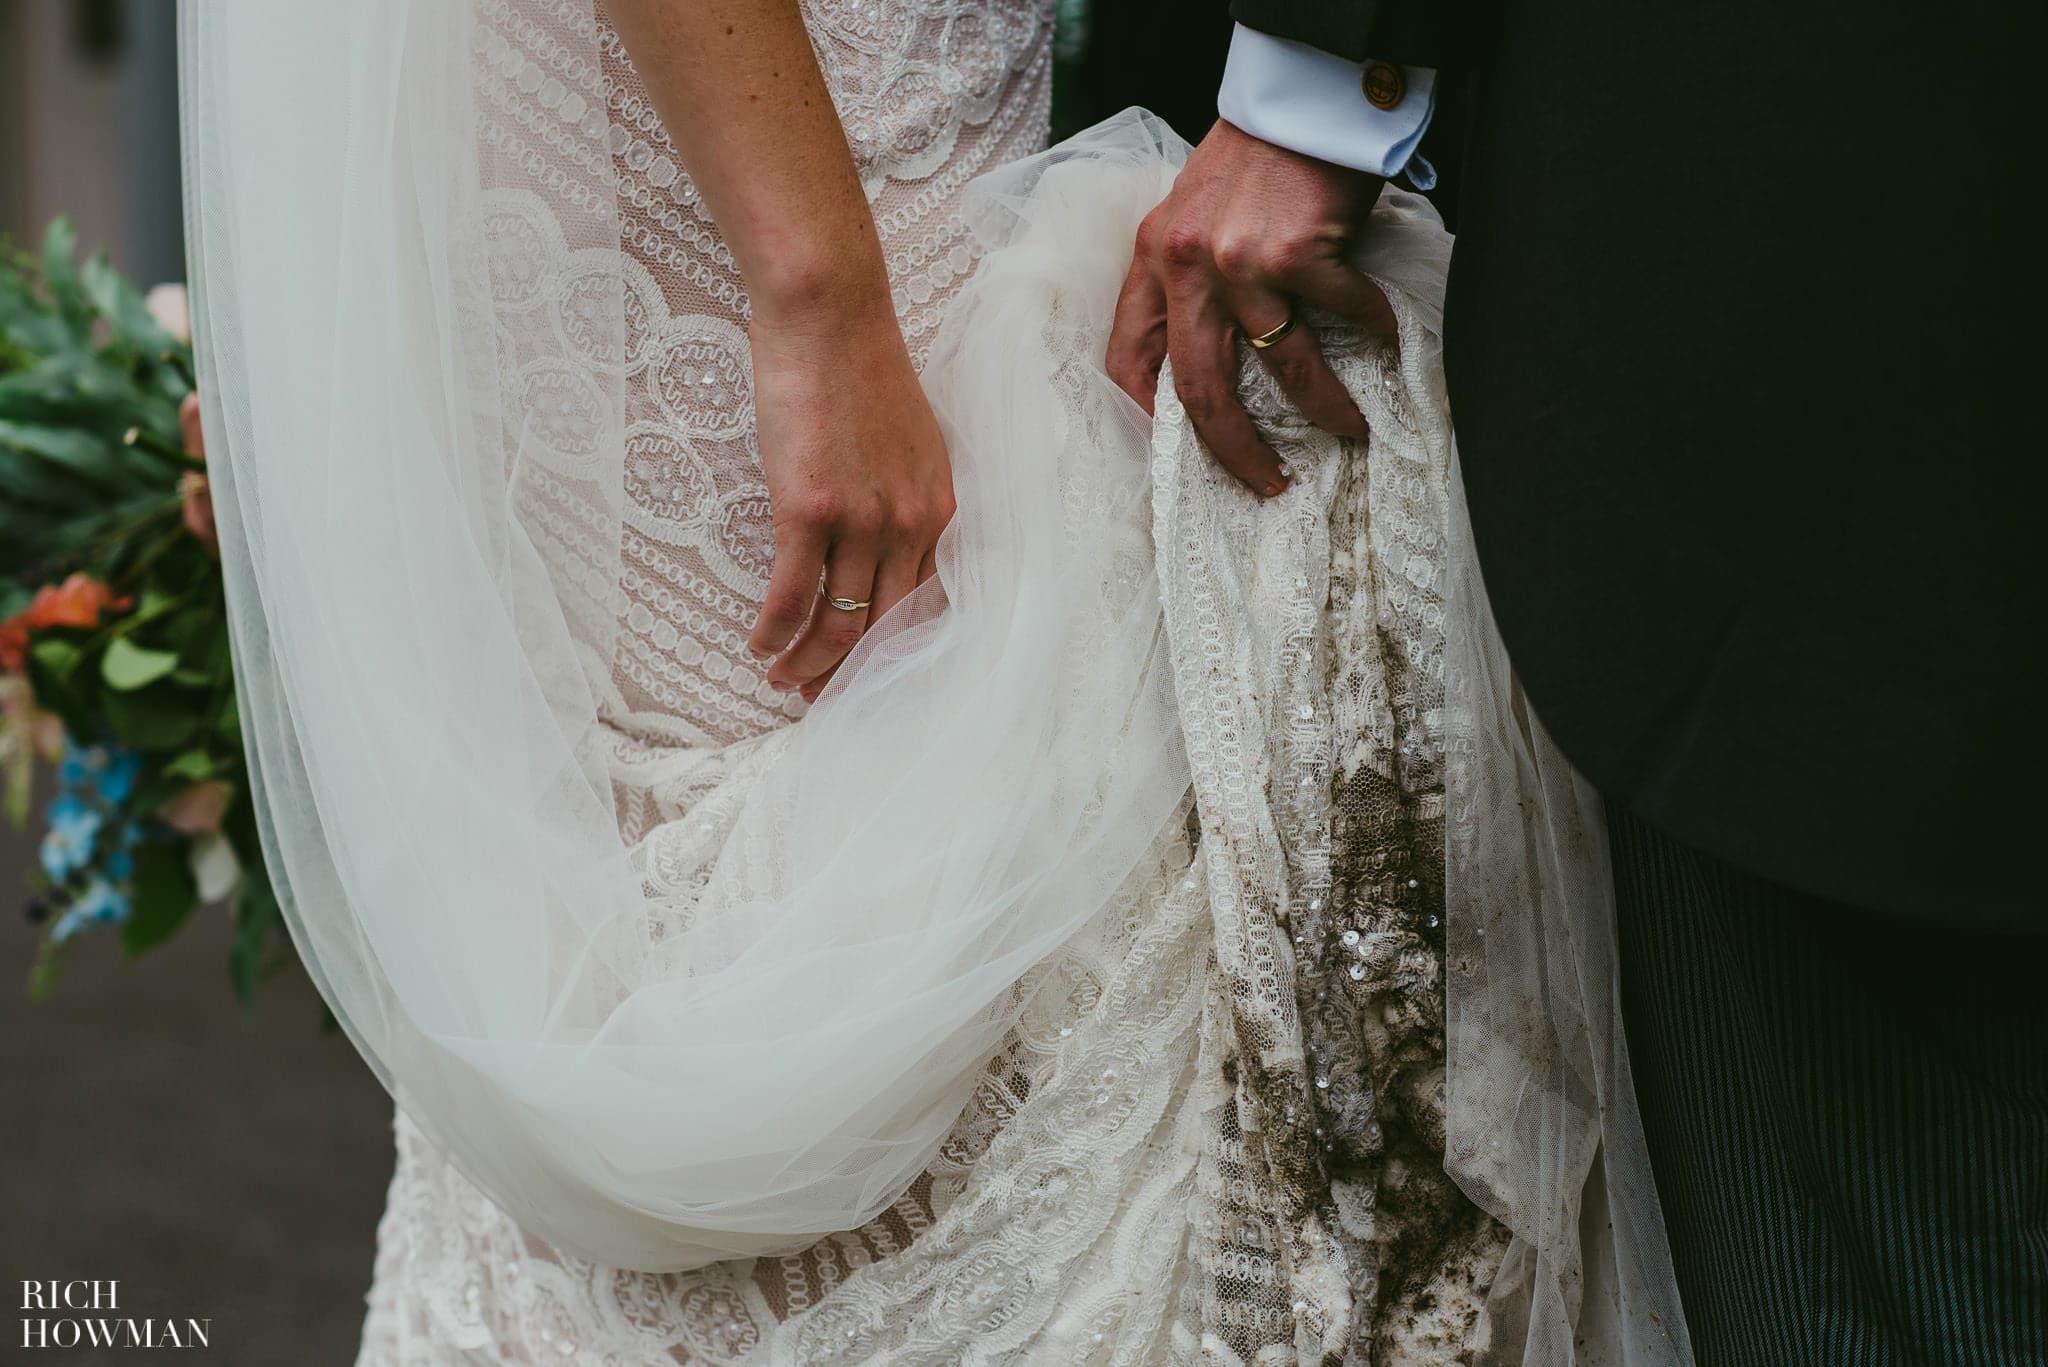 Hands holding up a dirty wedding dress.